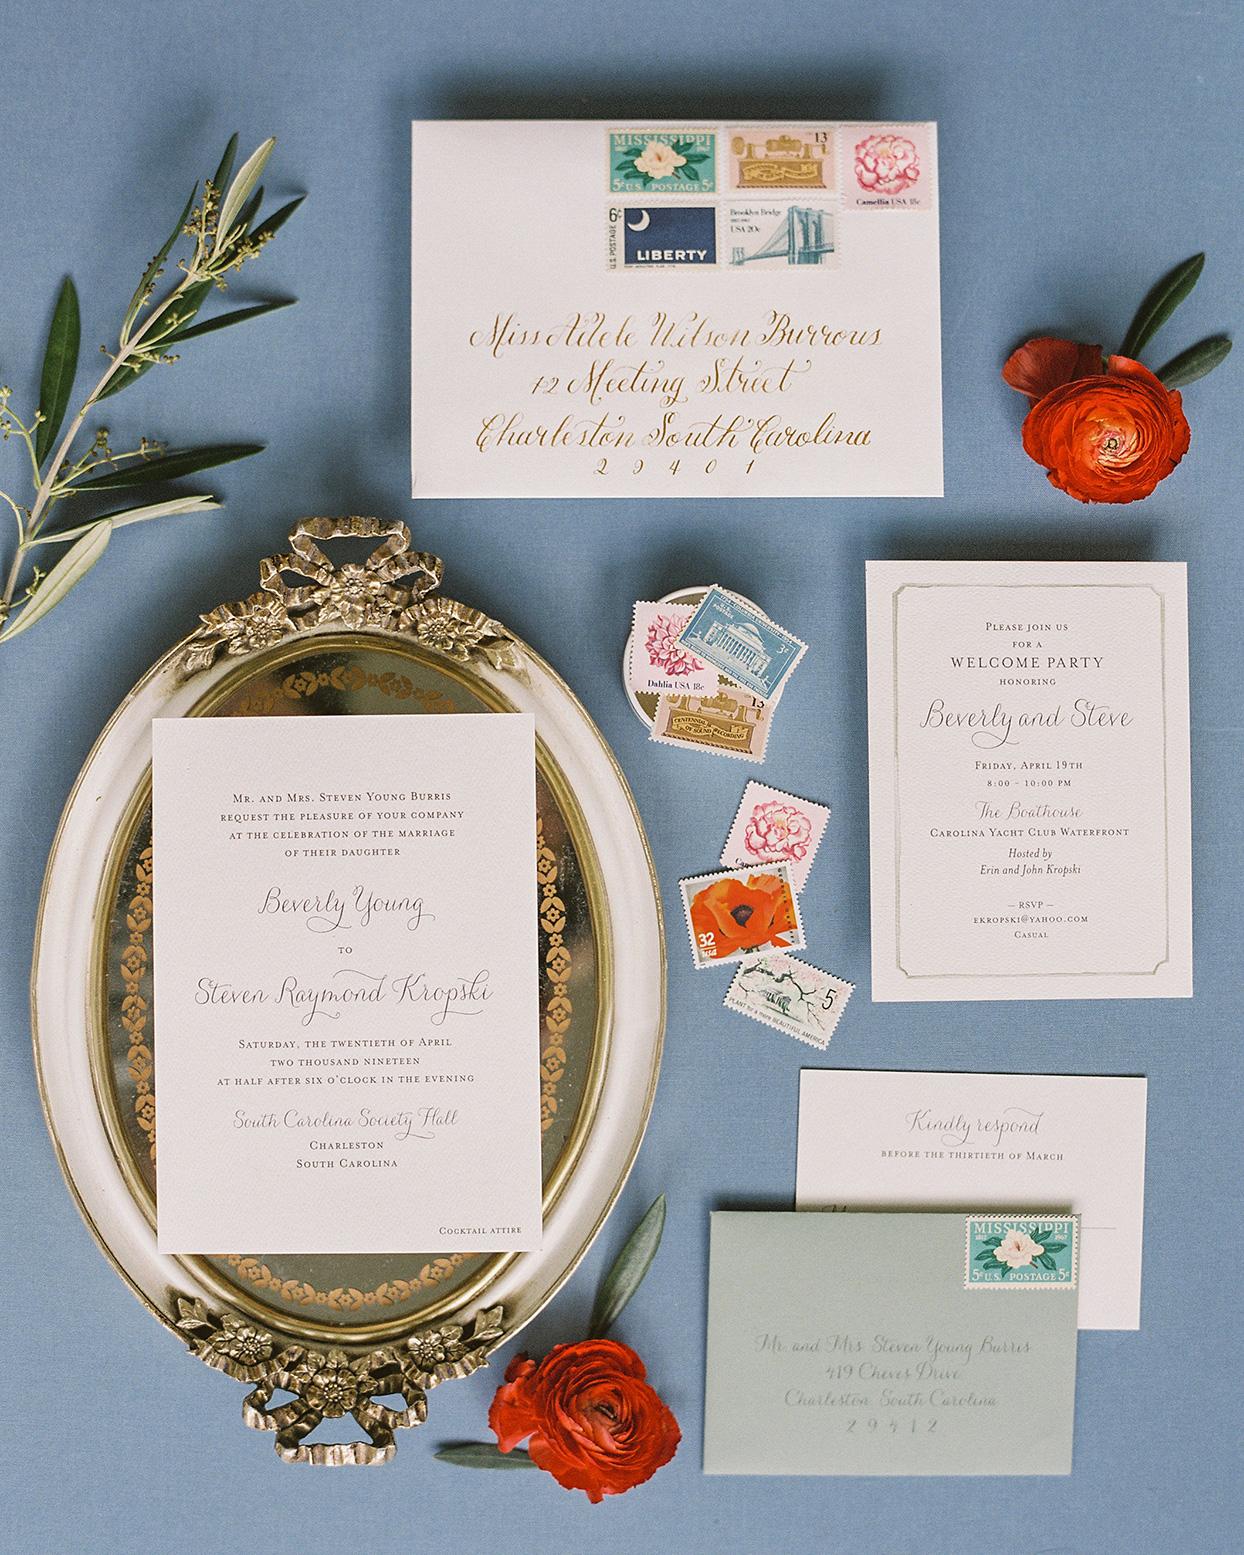 beverly steve ornate wedding invitations